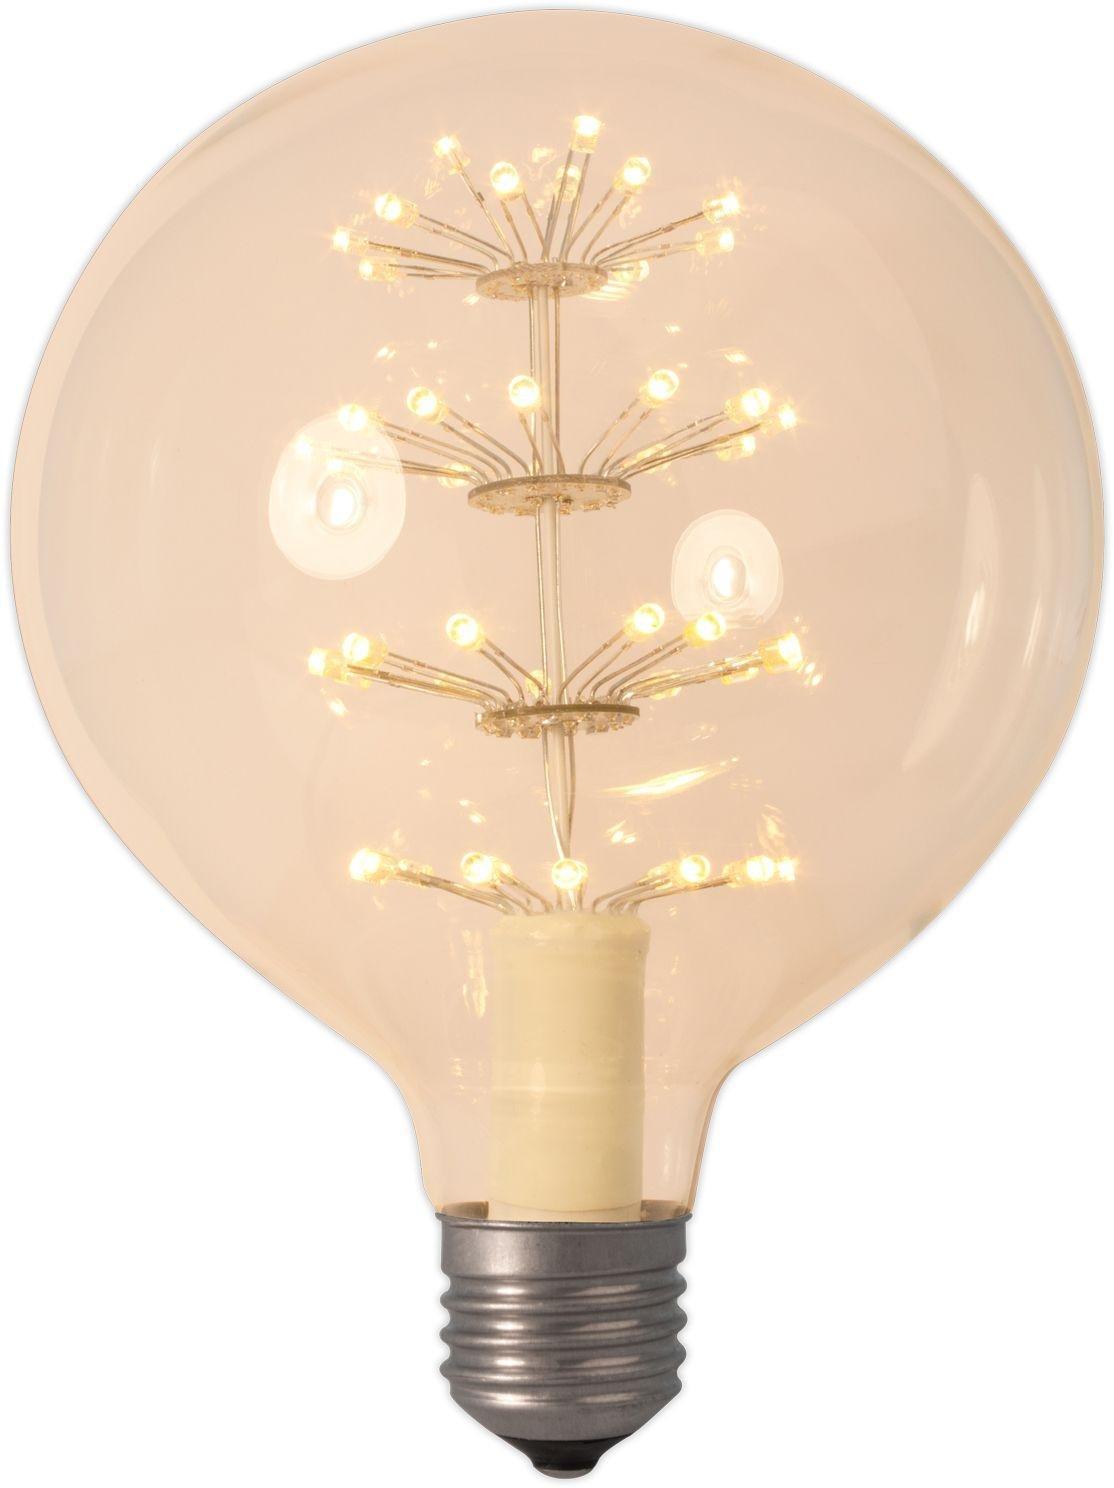 Image of Calex Decorative Pearl LED 125mm Large Globe Warm White Bulb